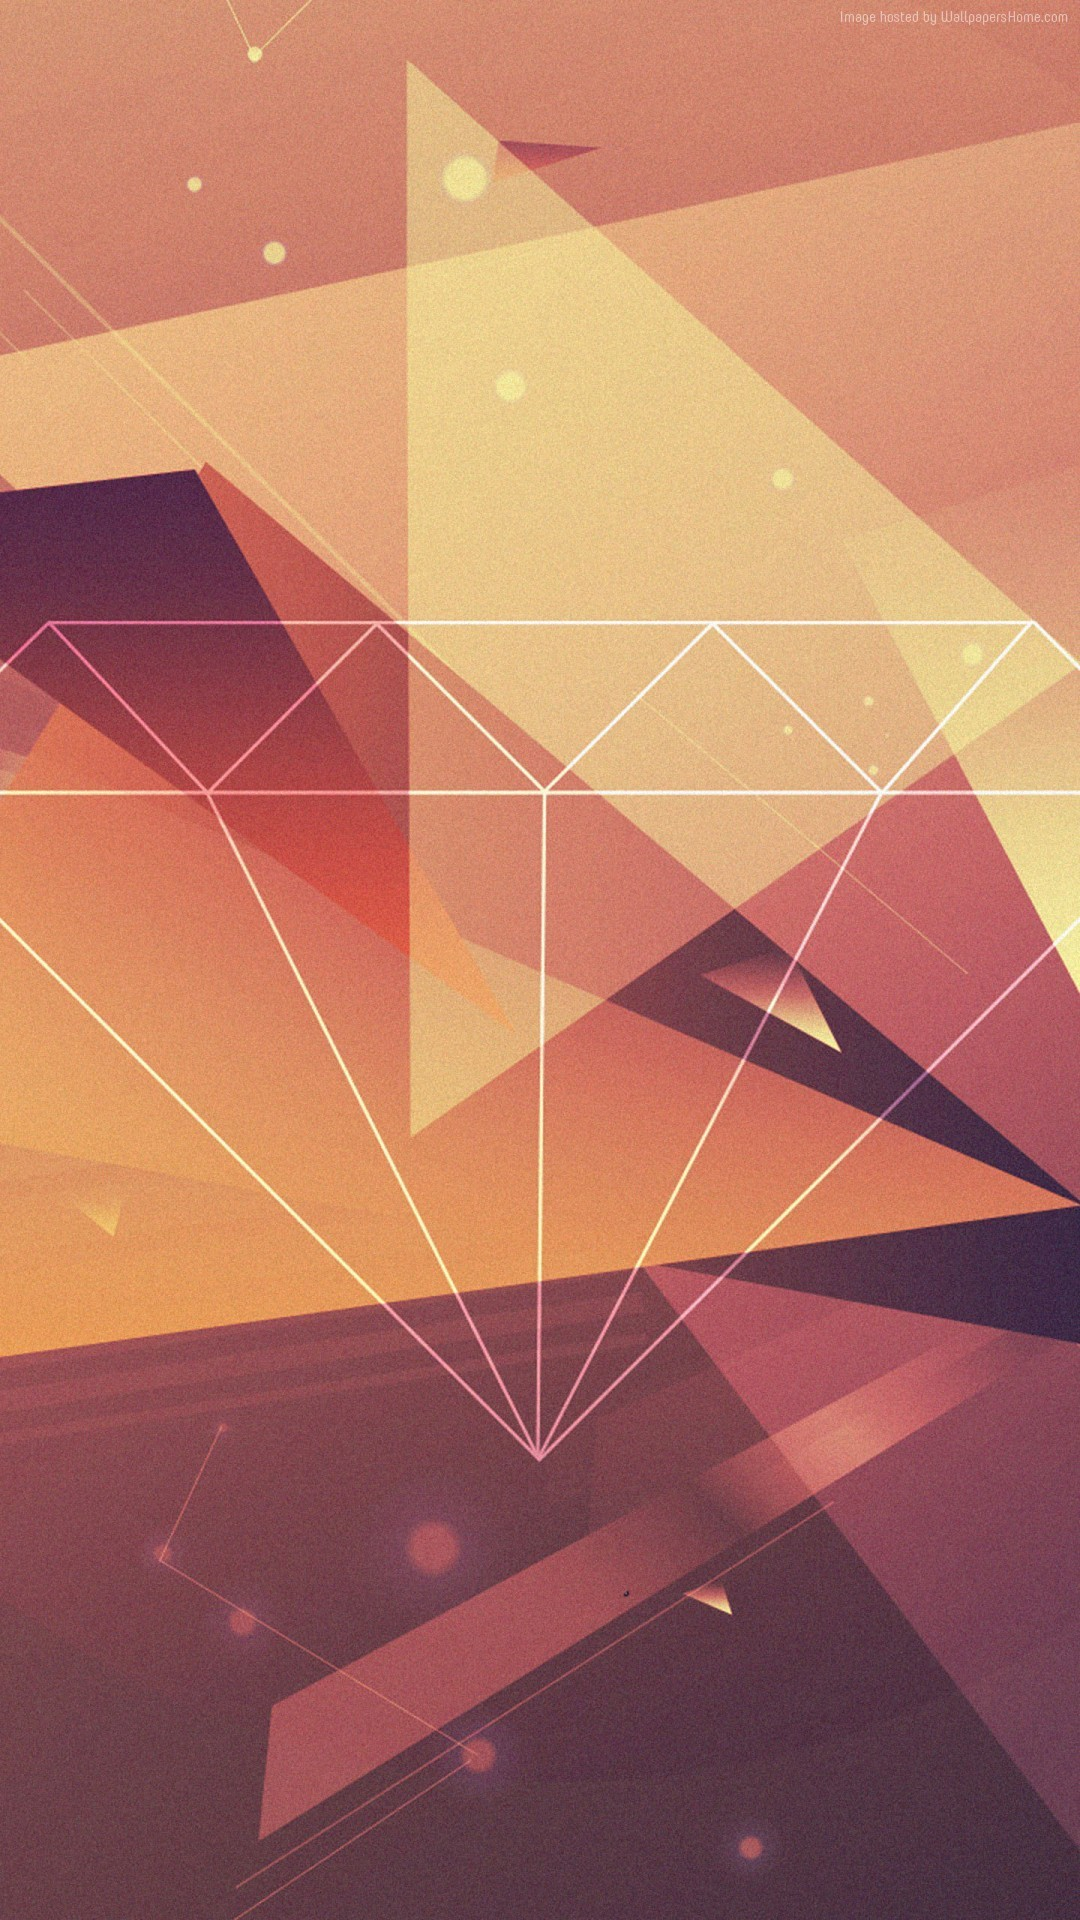 … poligon wallpaper iphone 7 polygon 4k 5k wallpaper diamond lines …